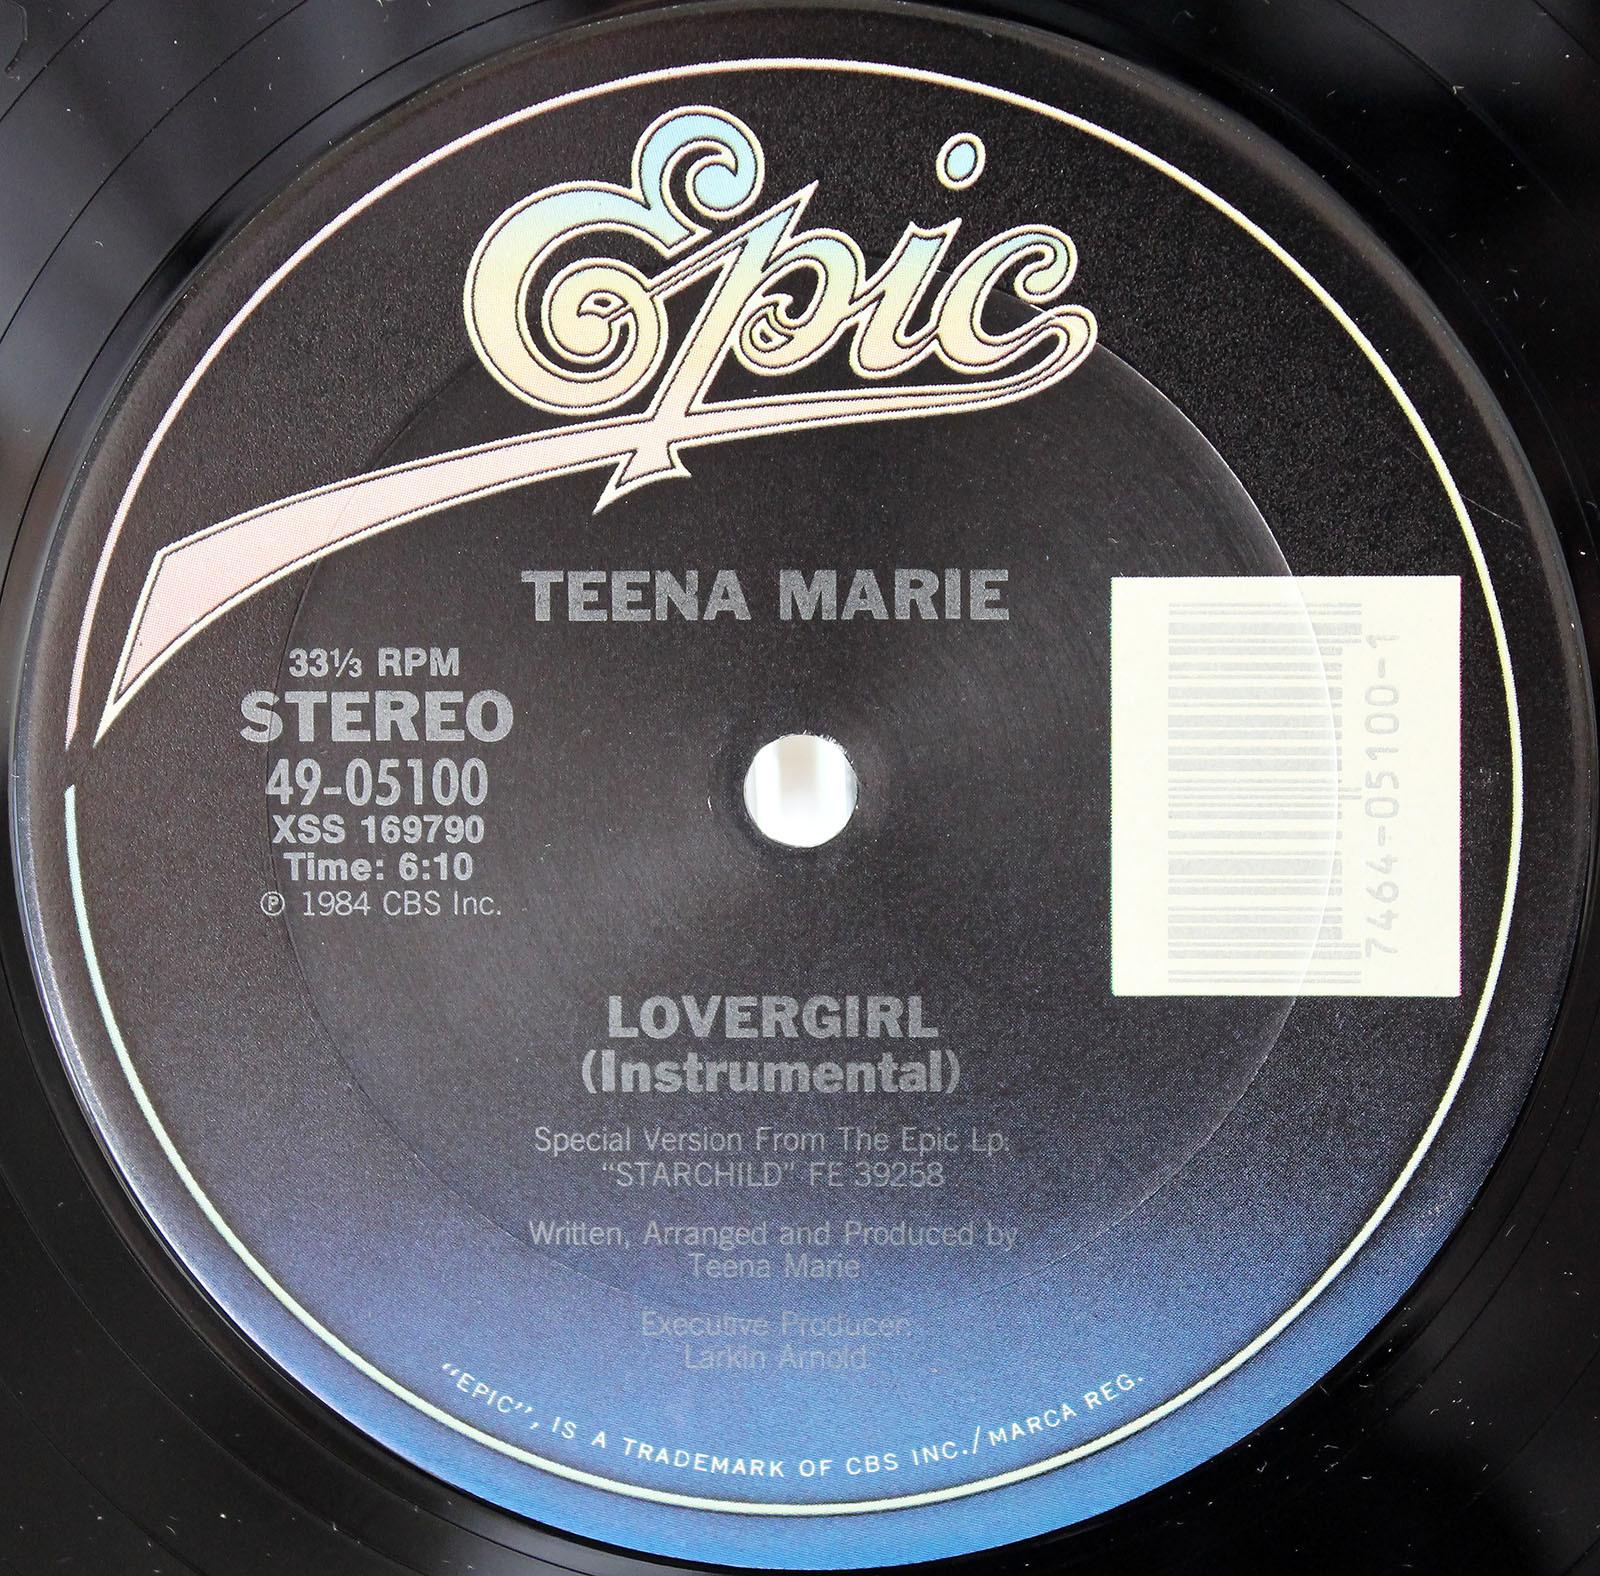 Teena Marie – Lovergirl 04